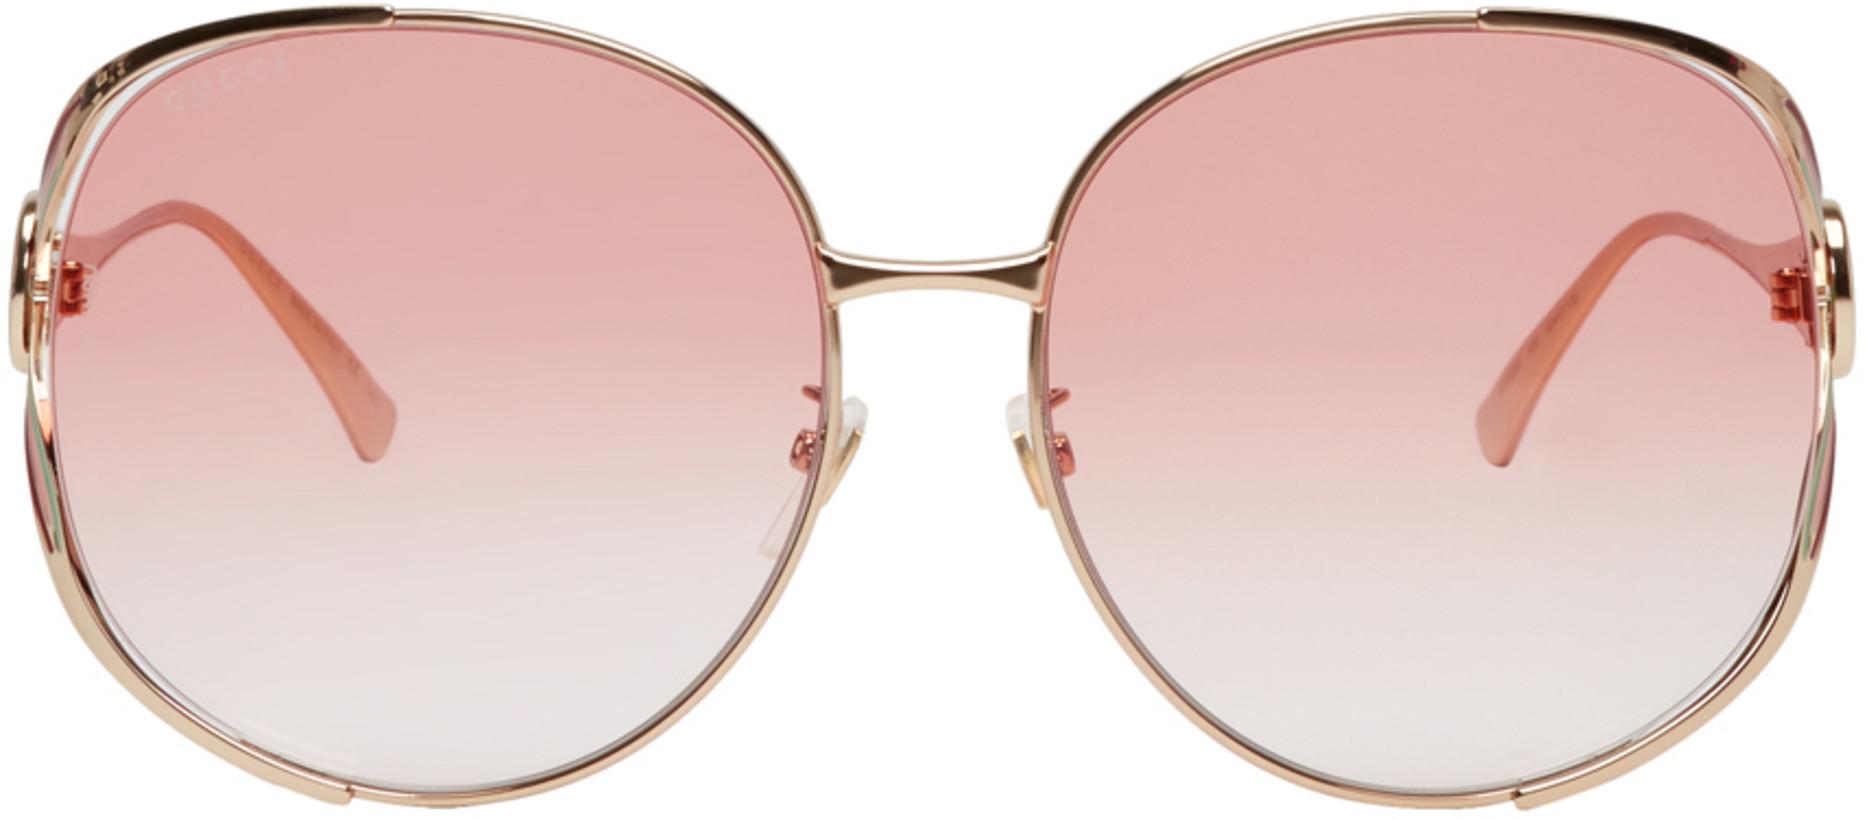 Gucci Pink Urban Fork Sunglasses